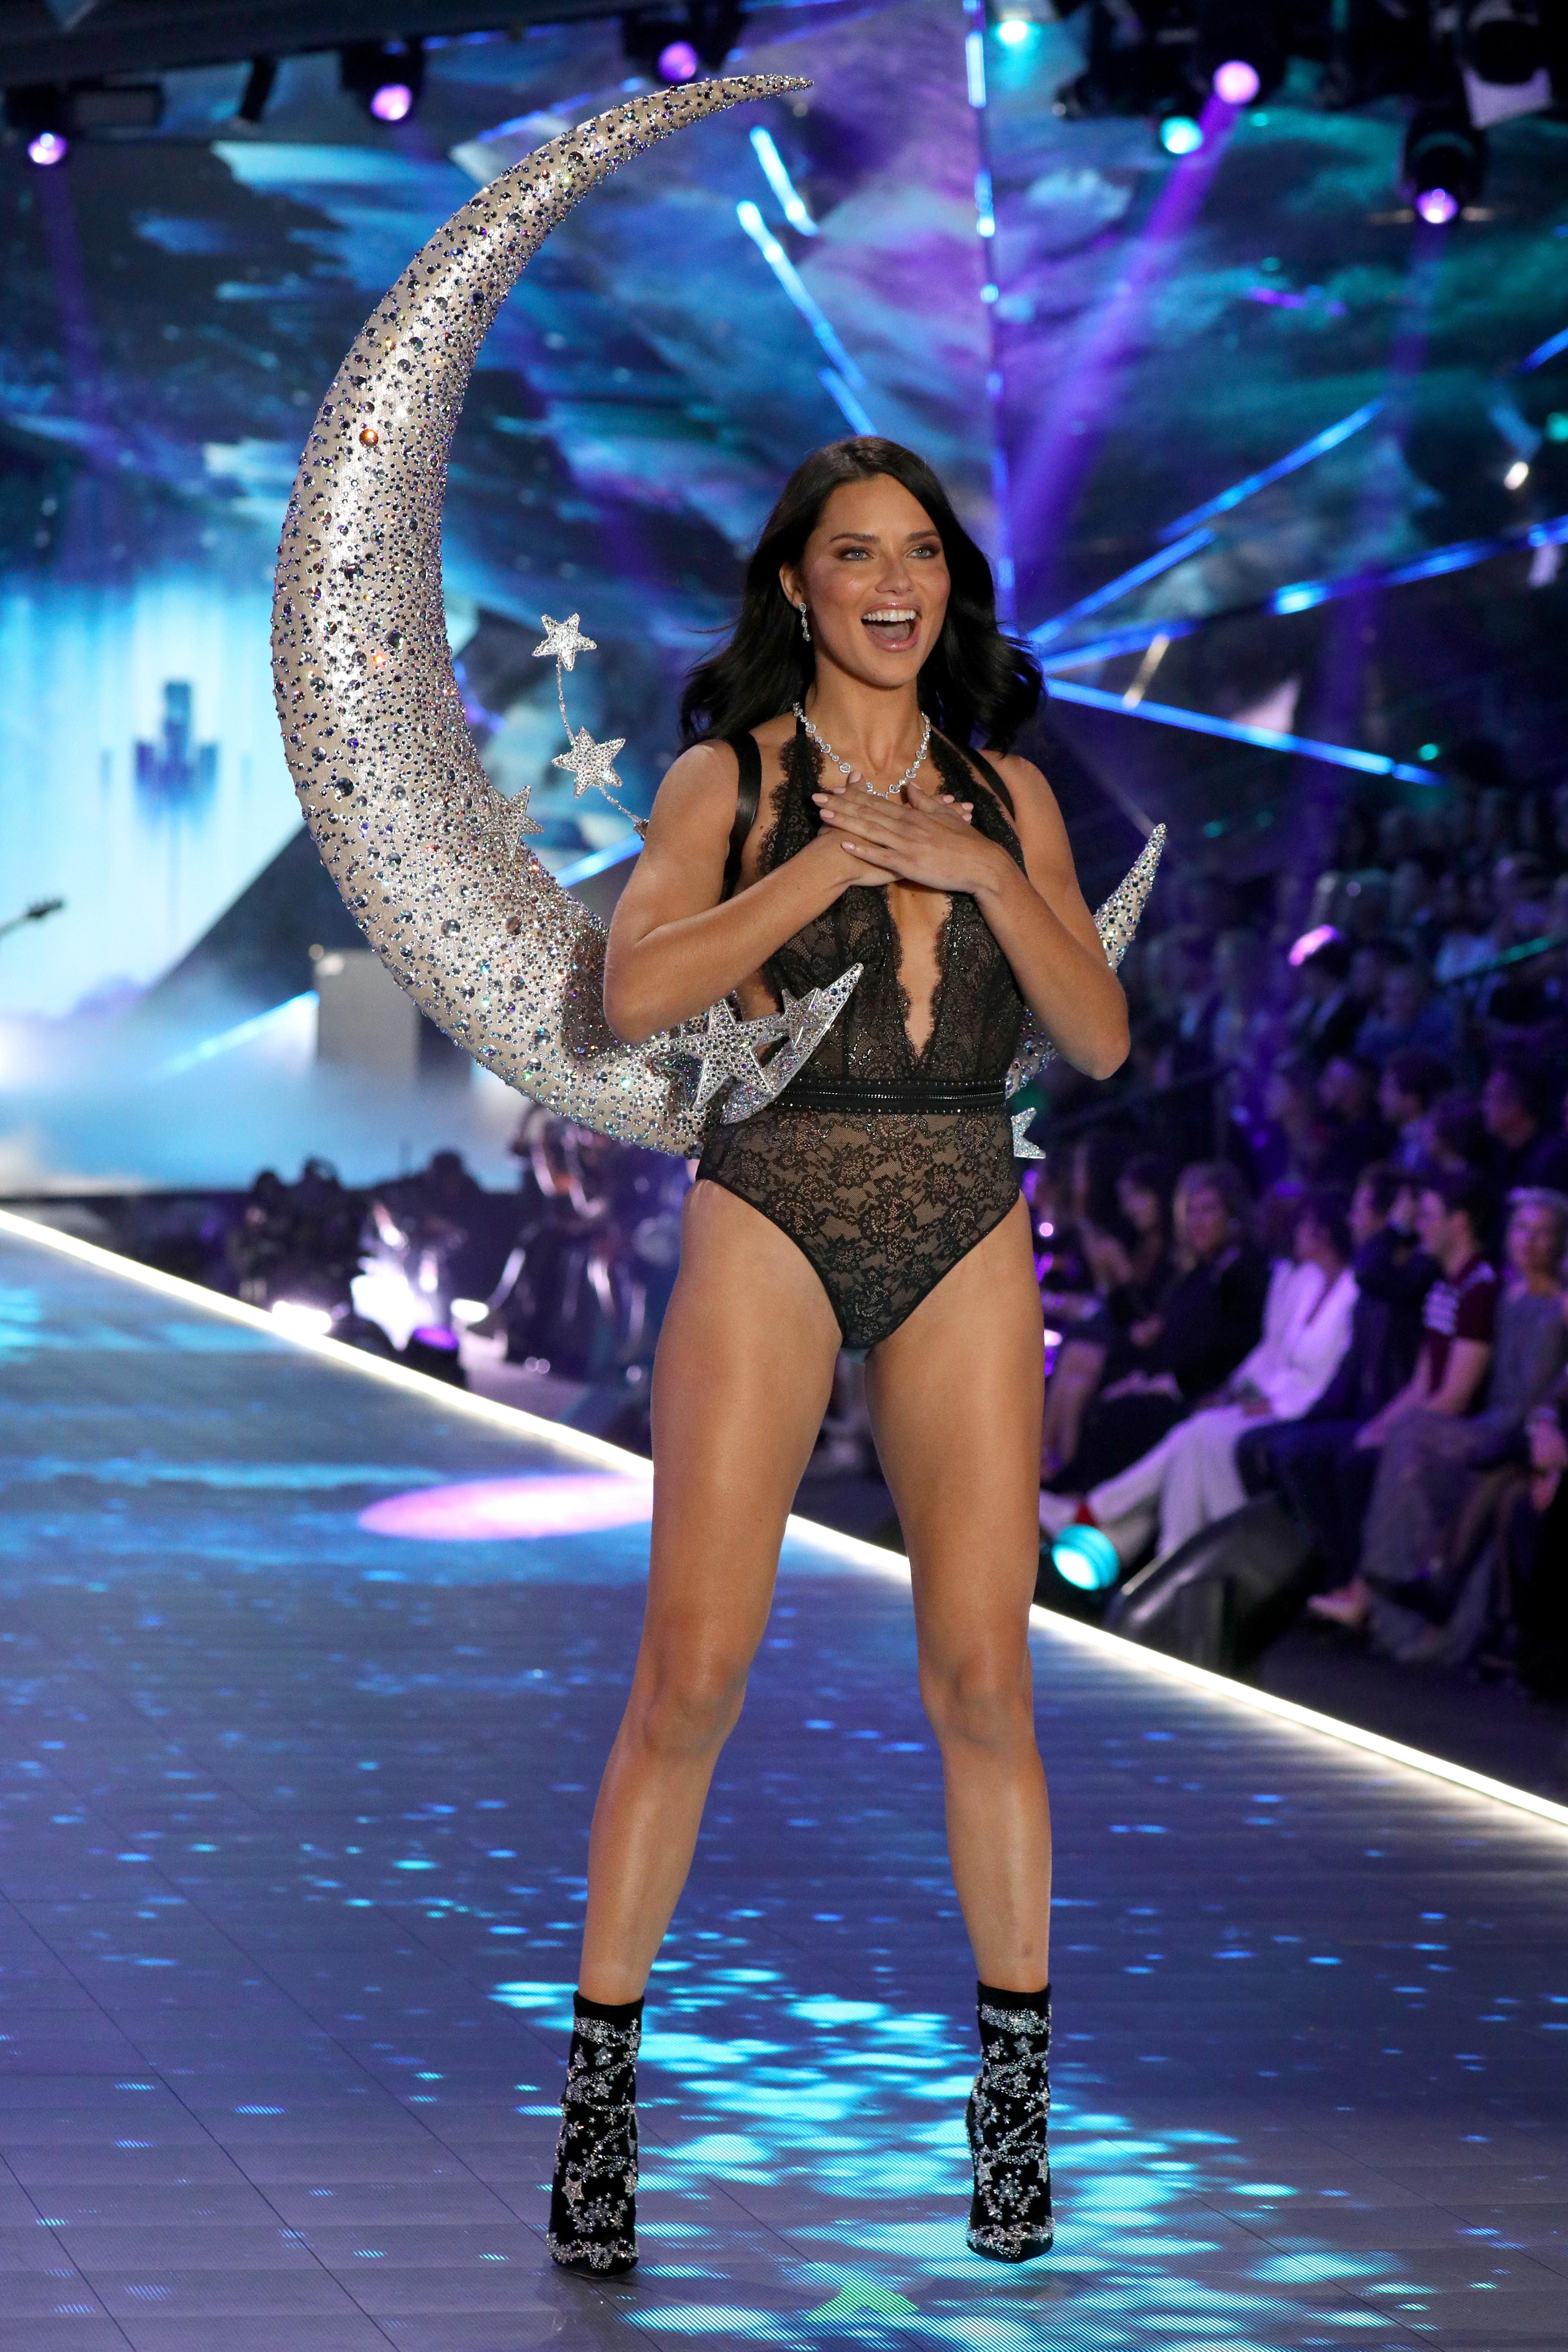 https://www.harpersbazaar.mx/moda/pasarelas/adriana-lima-adios-victoria-secret-fashion-show-2018-llora/